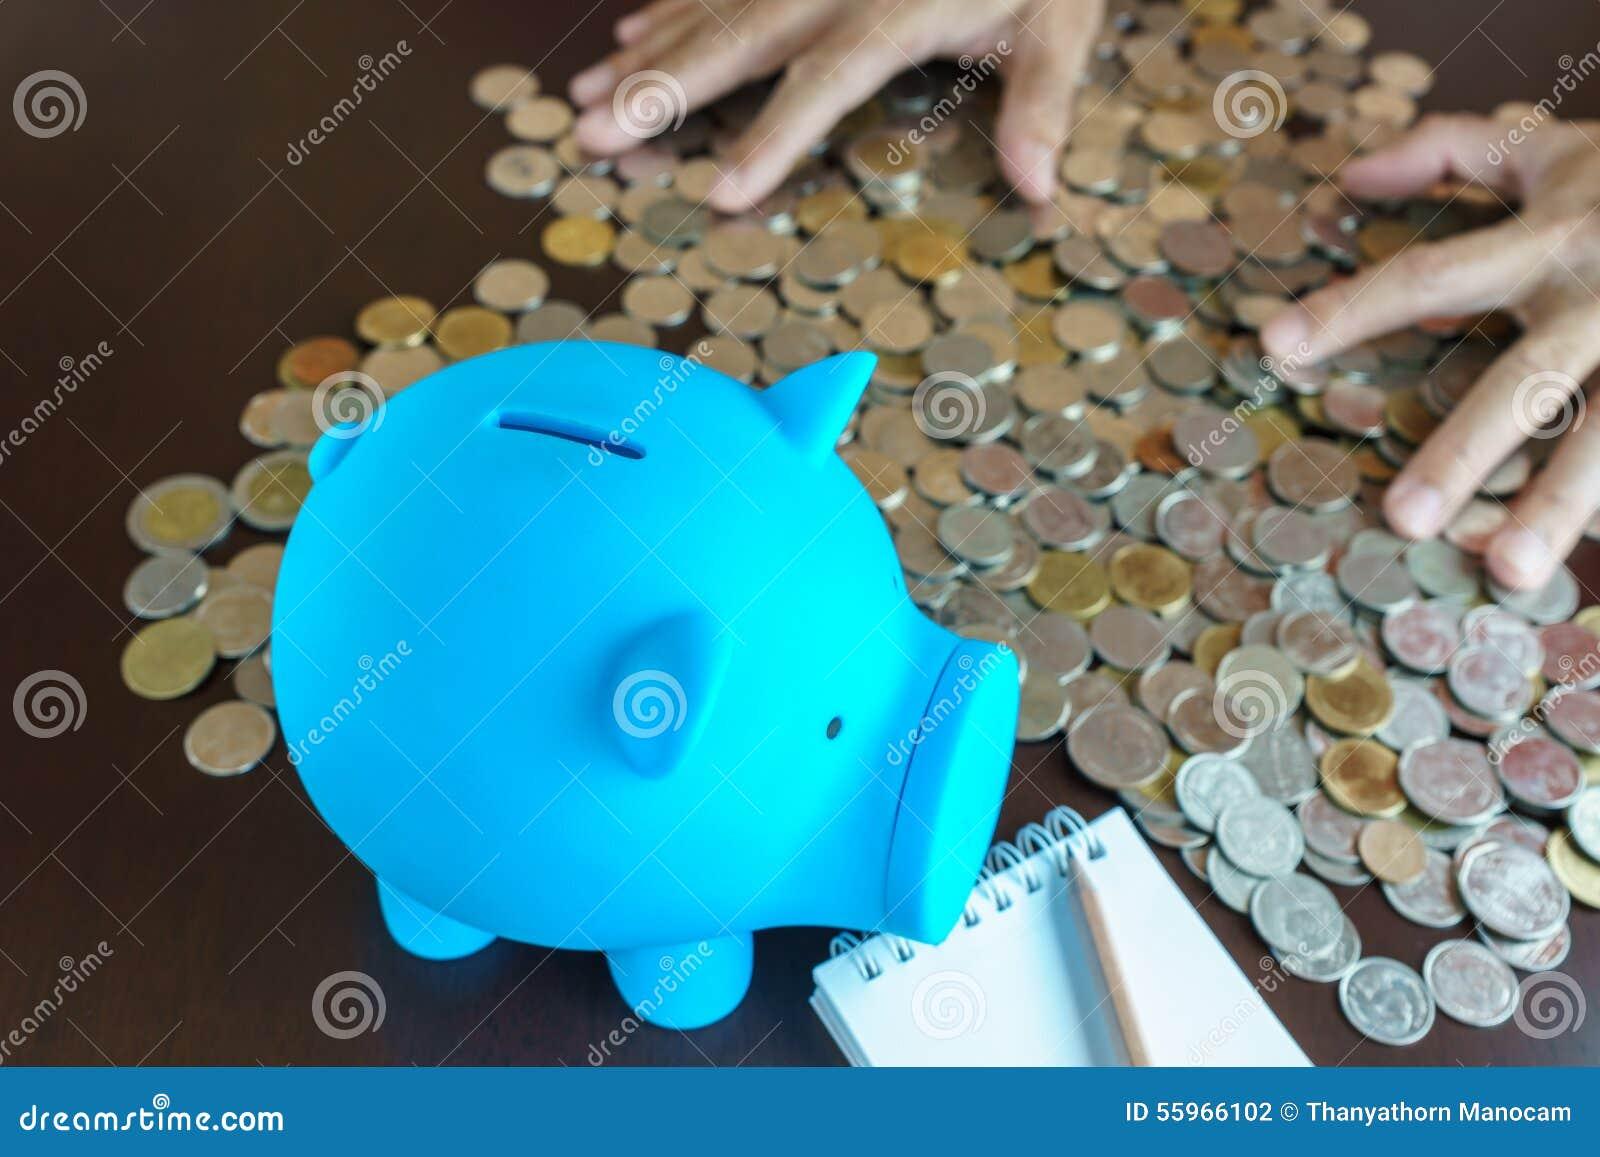 Man hand collect the money coin into blue piggy bank